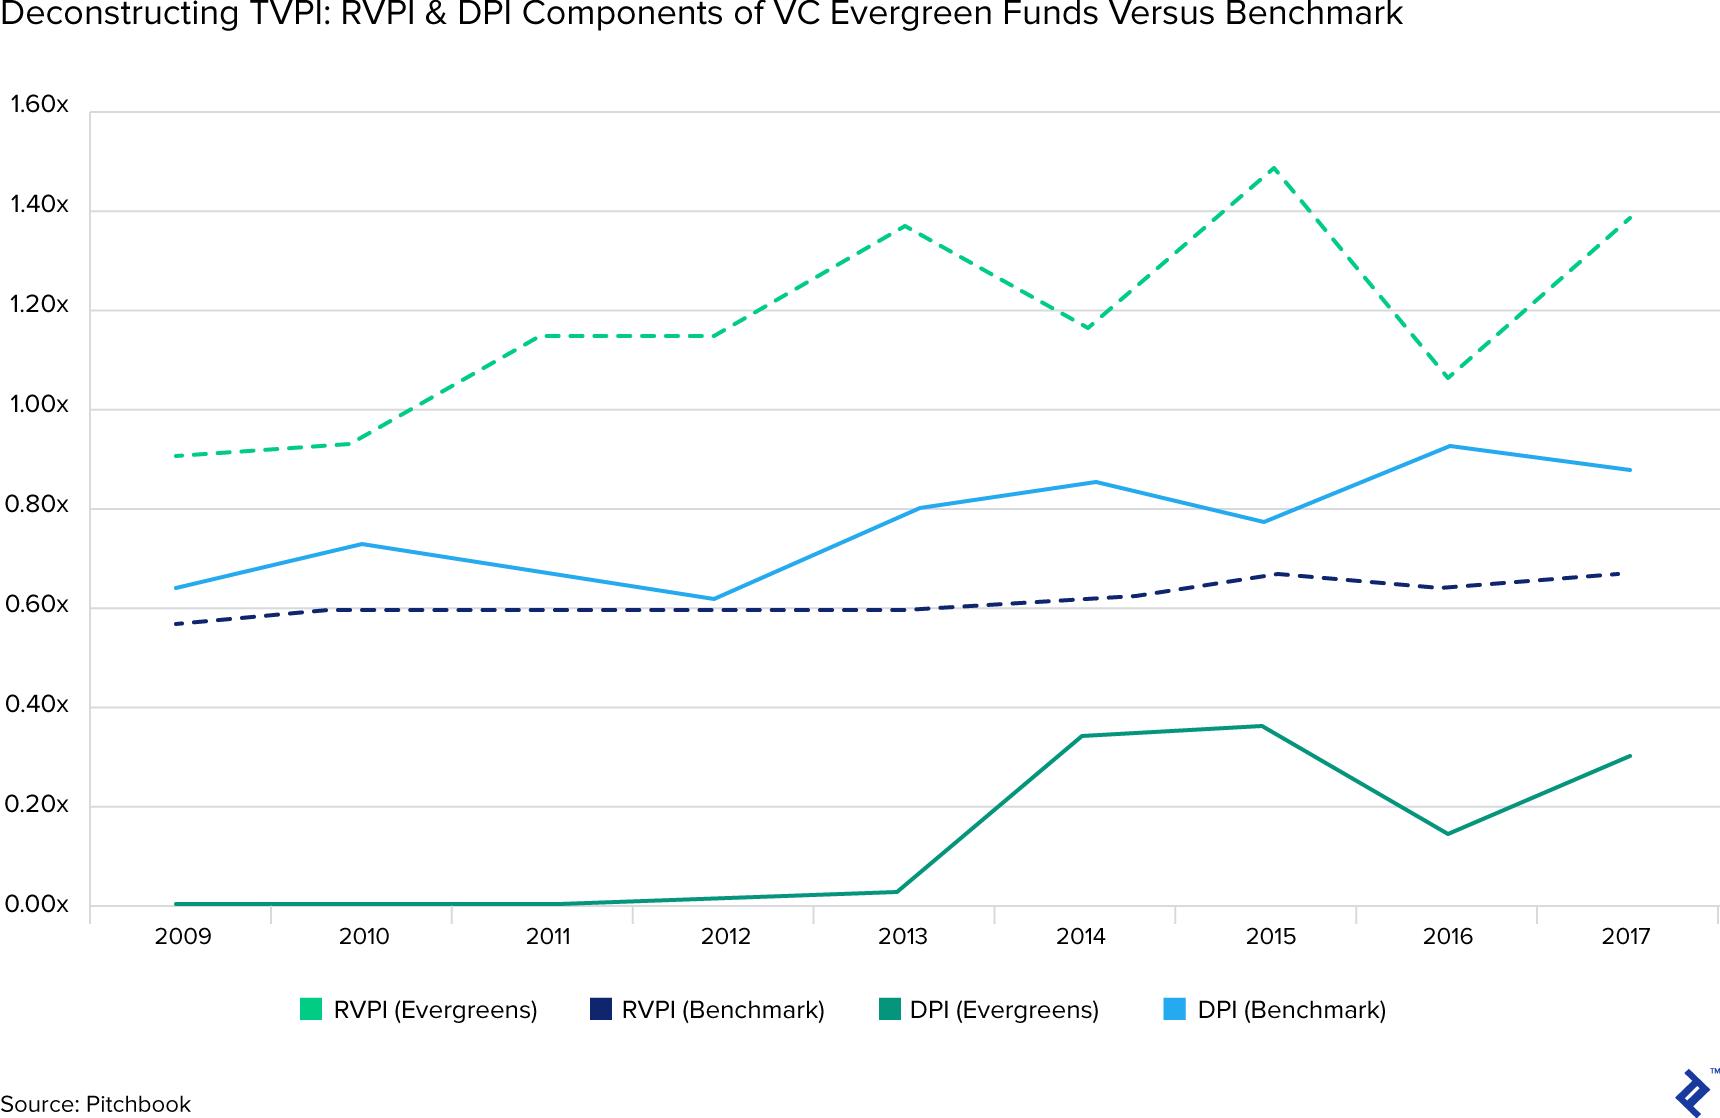 Deconstructing TVPI: RVPI and DPI components of VC evergreen funds versus benchmark